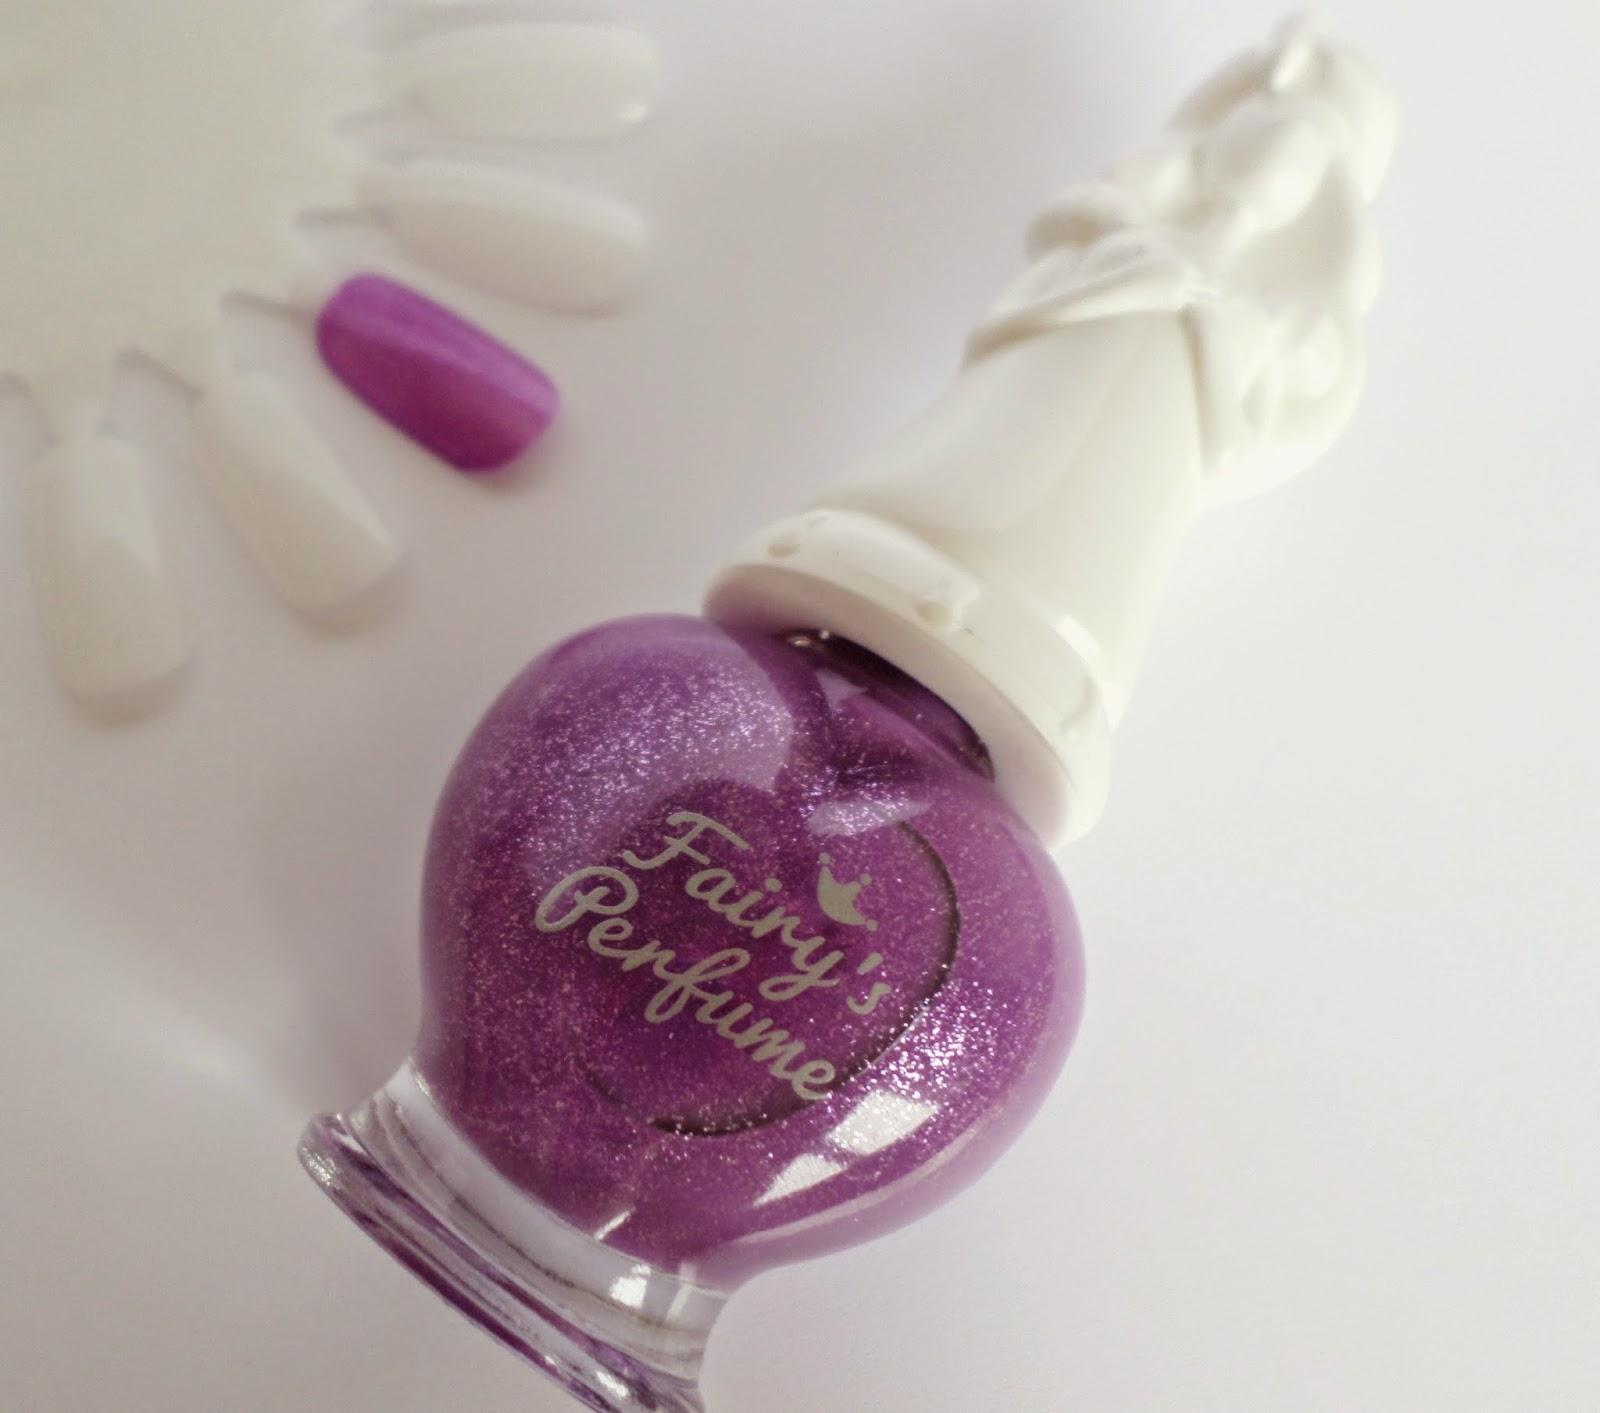 Shara Shara Fairy's Perfume Nail Polish VL01 Lilac Bora 65g rrp $4